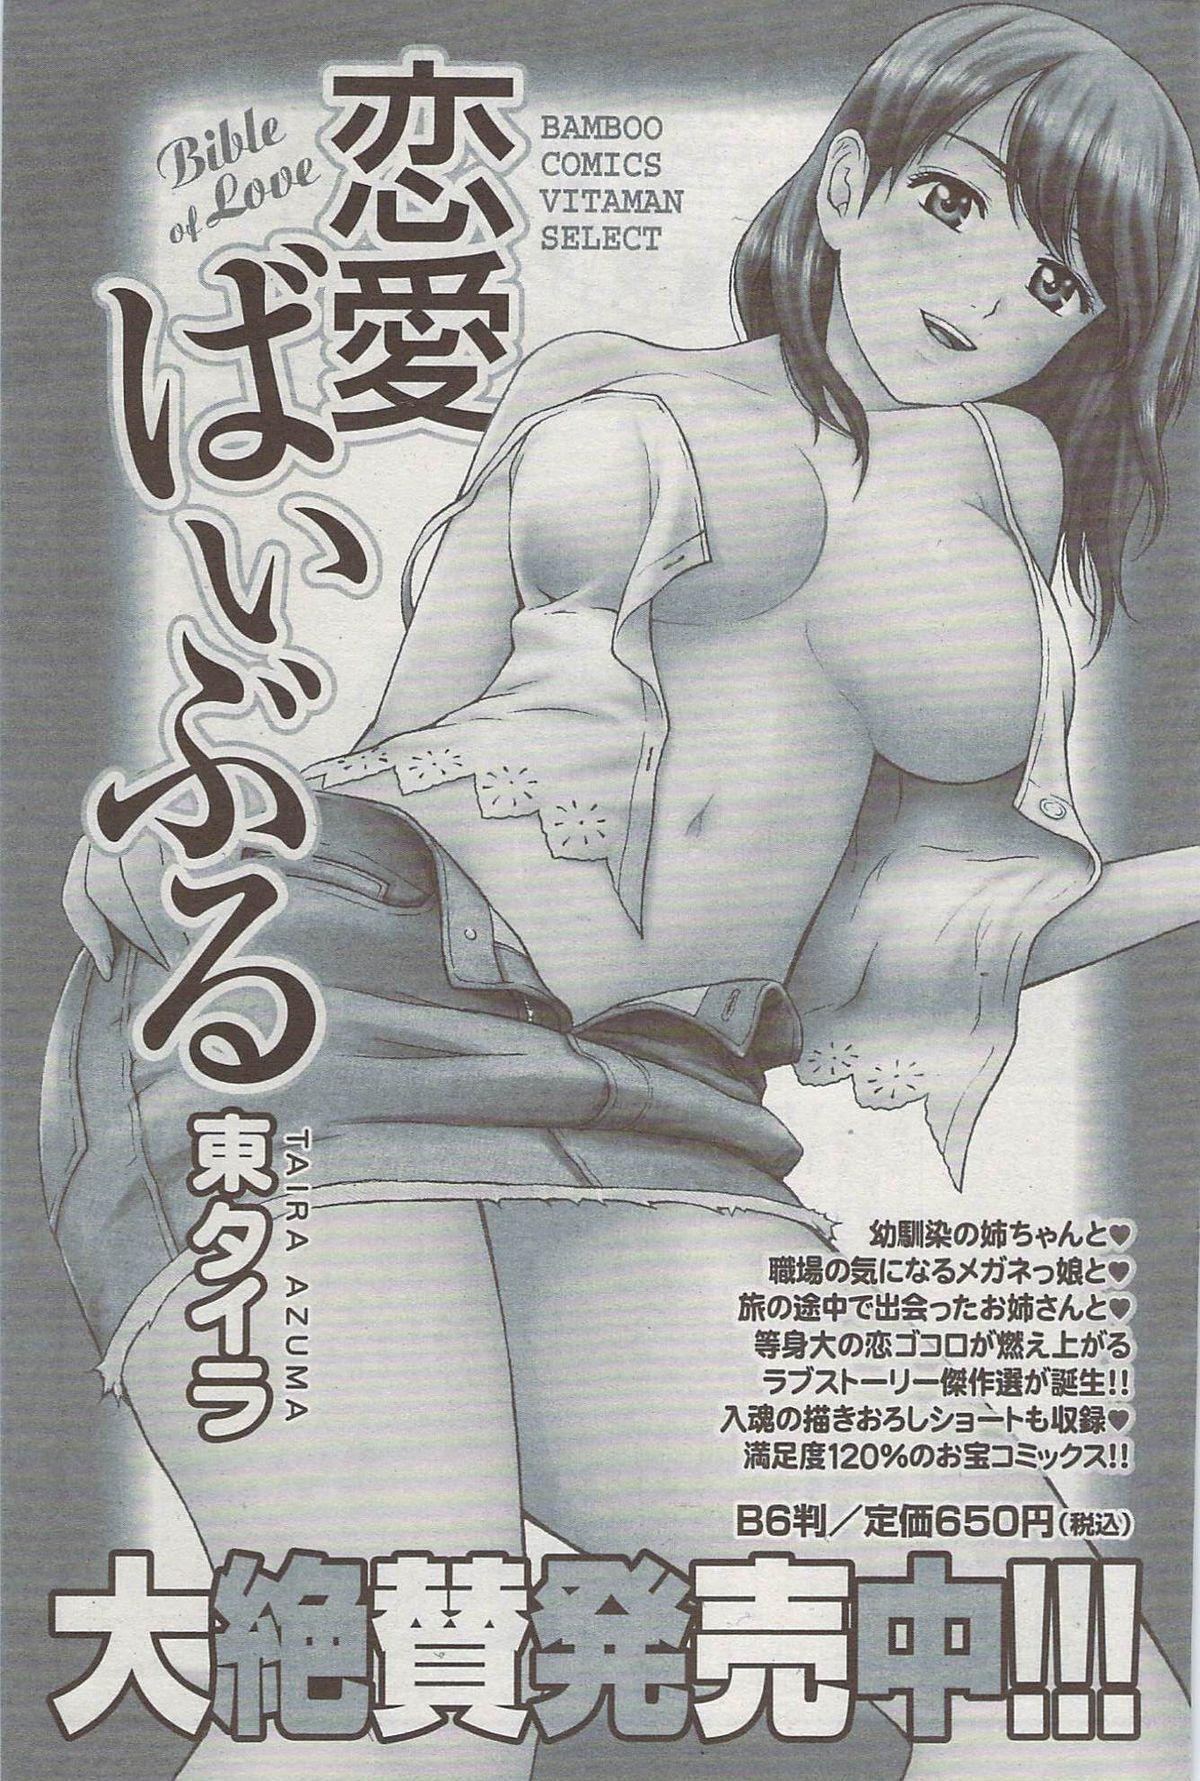 Monthly Vitaman 2009-08 177